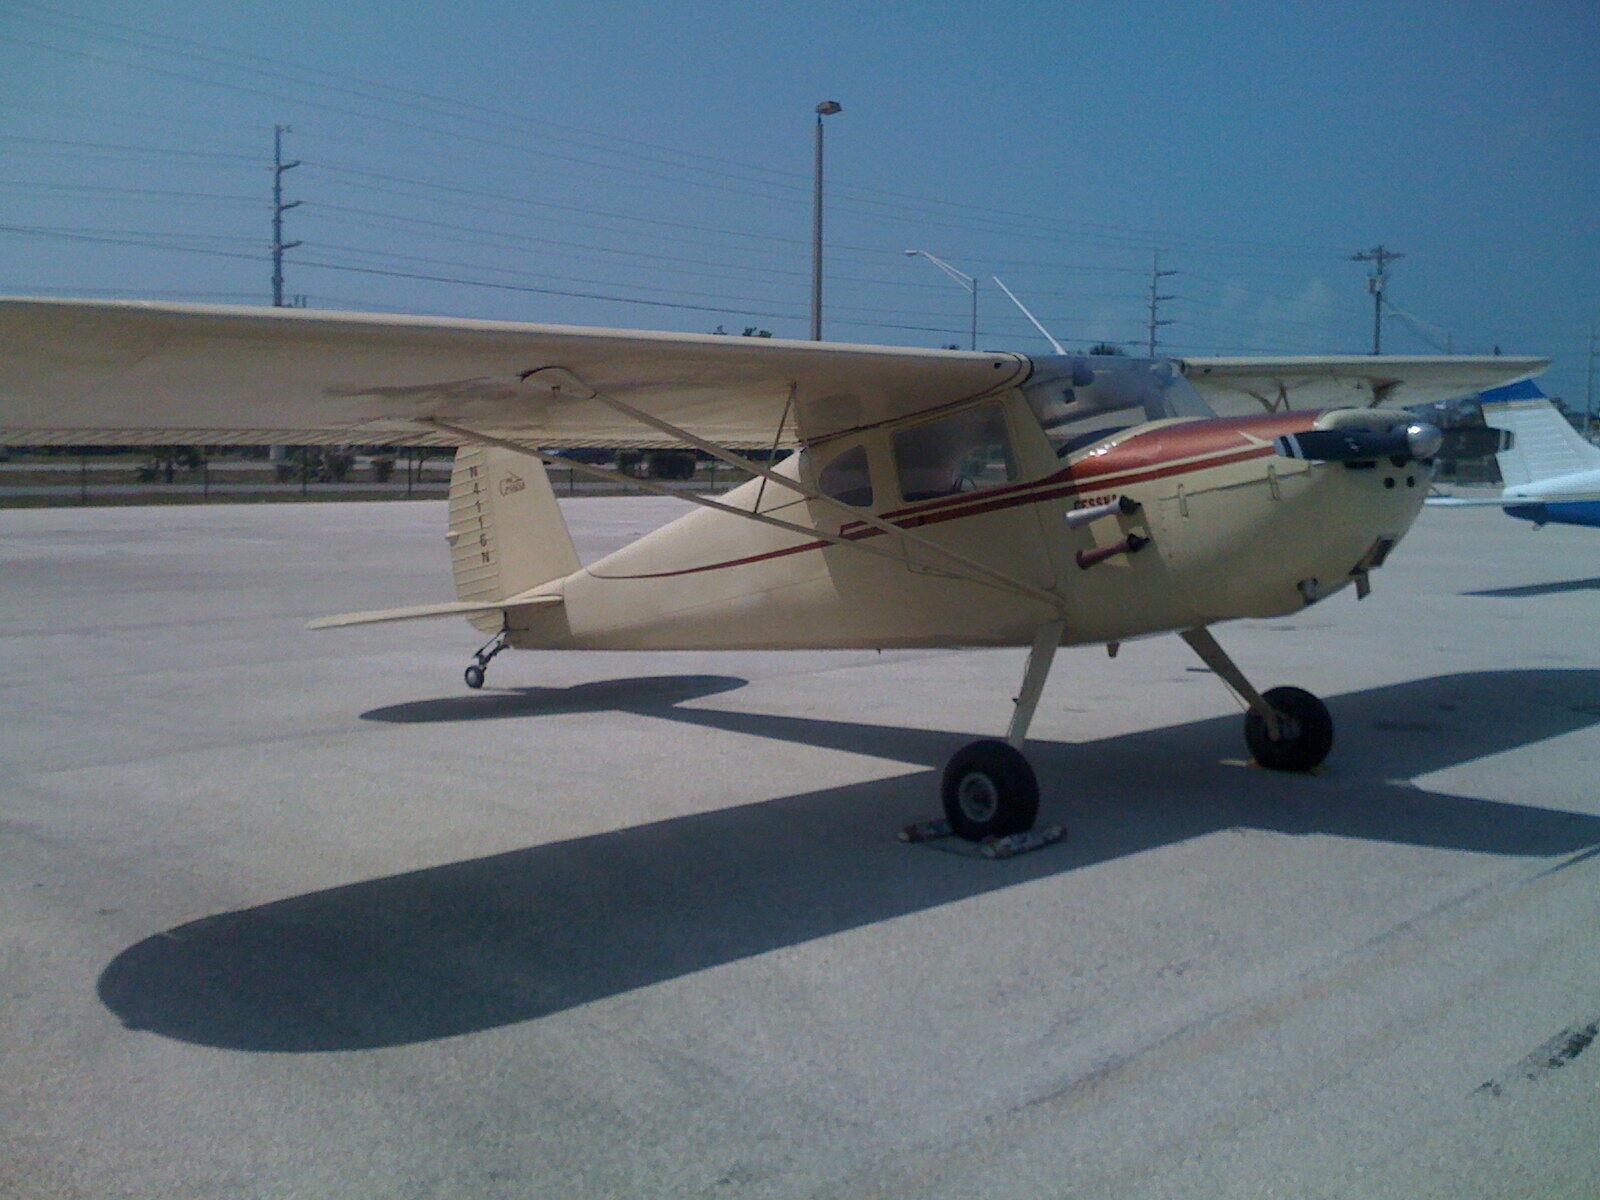 vintage 1947 Cessna 140 aircraft for sale